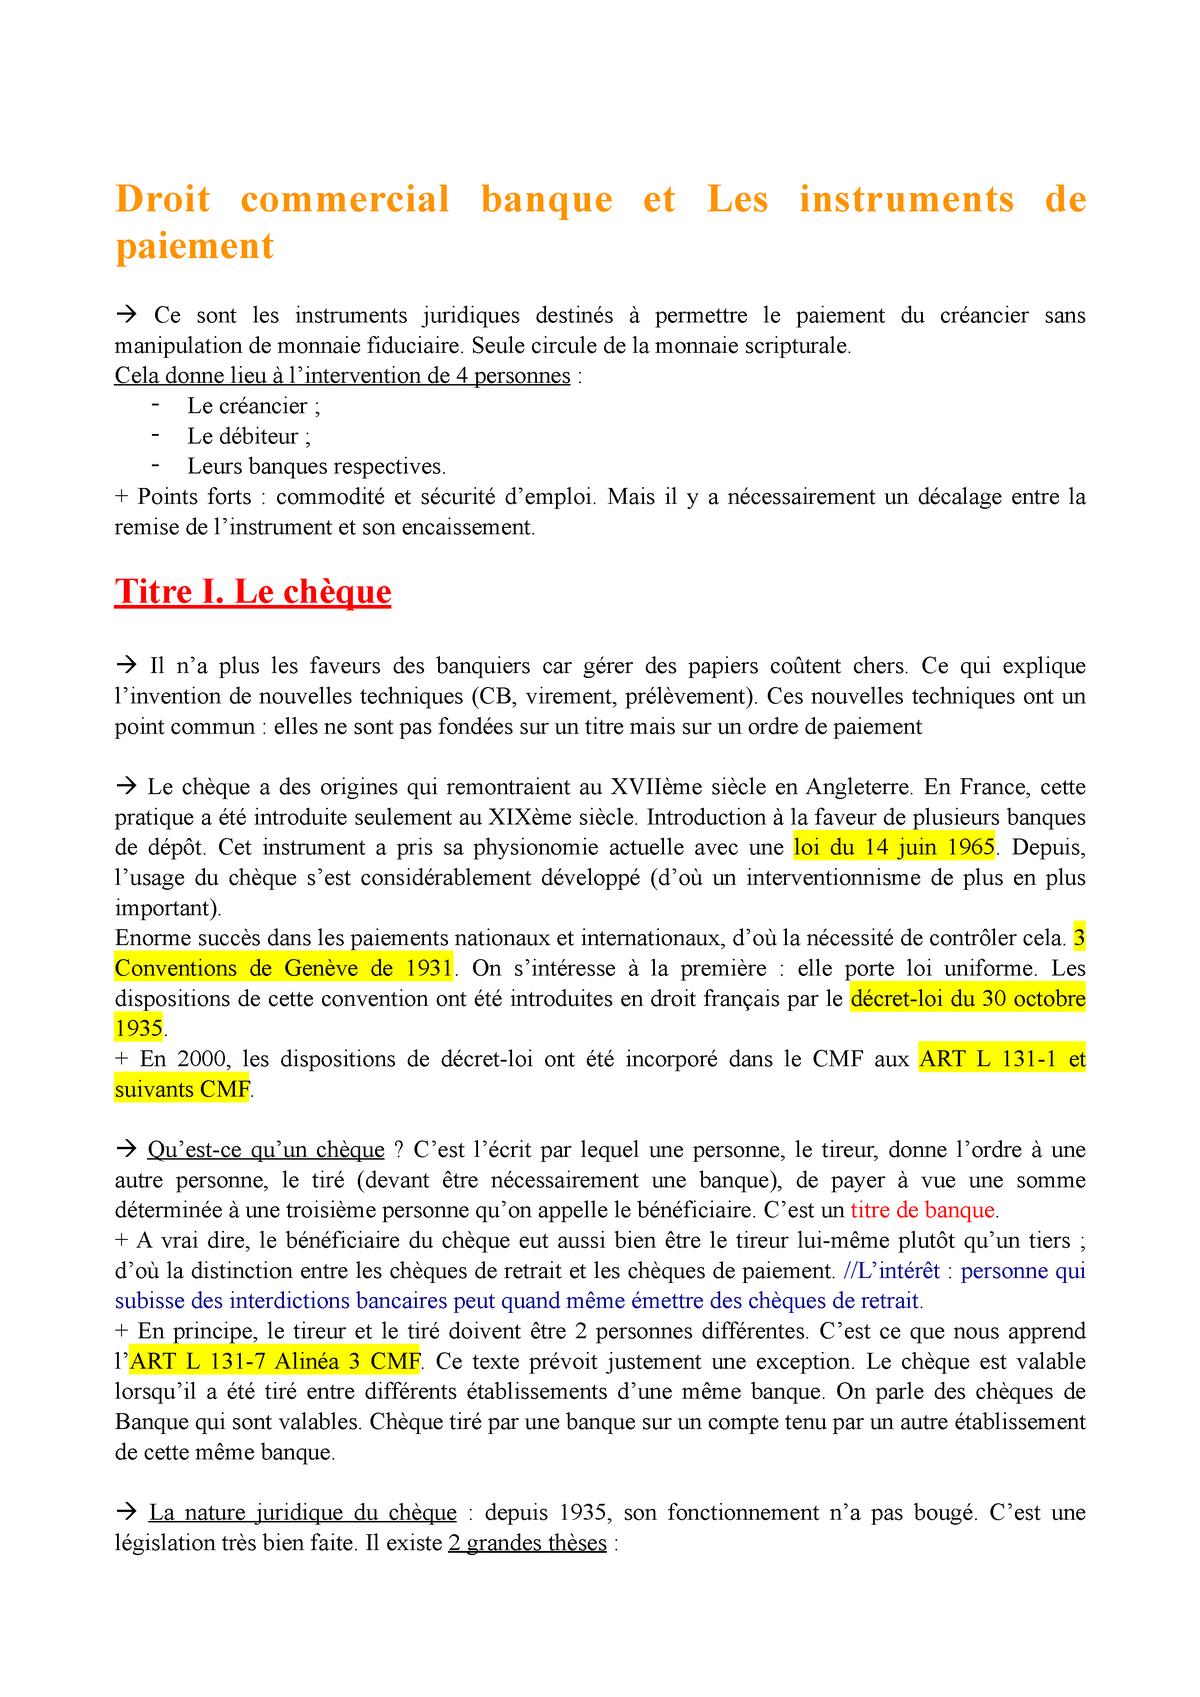 CHEQUE CASINO LE BANQIER VOIT IL